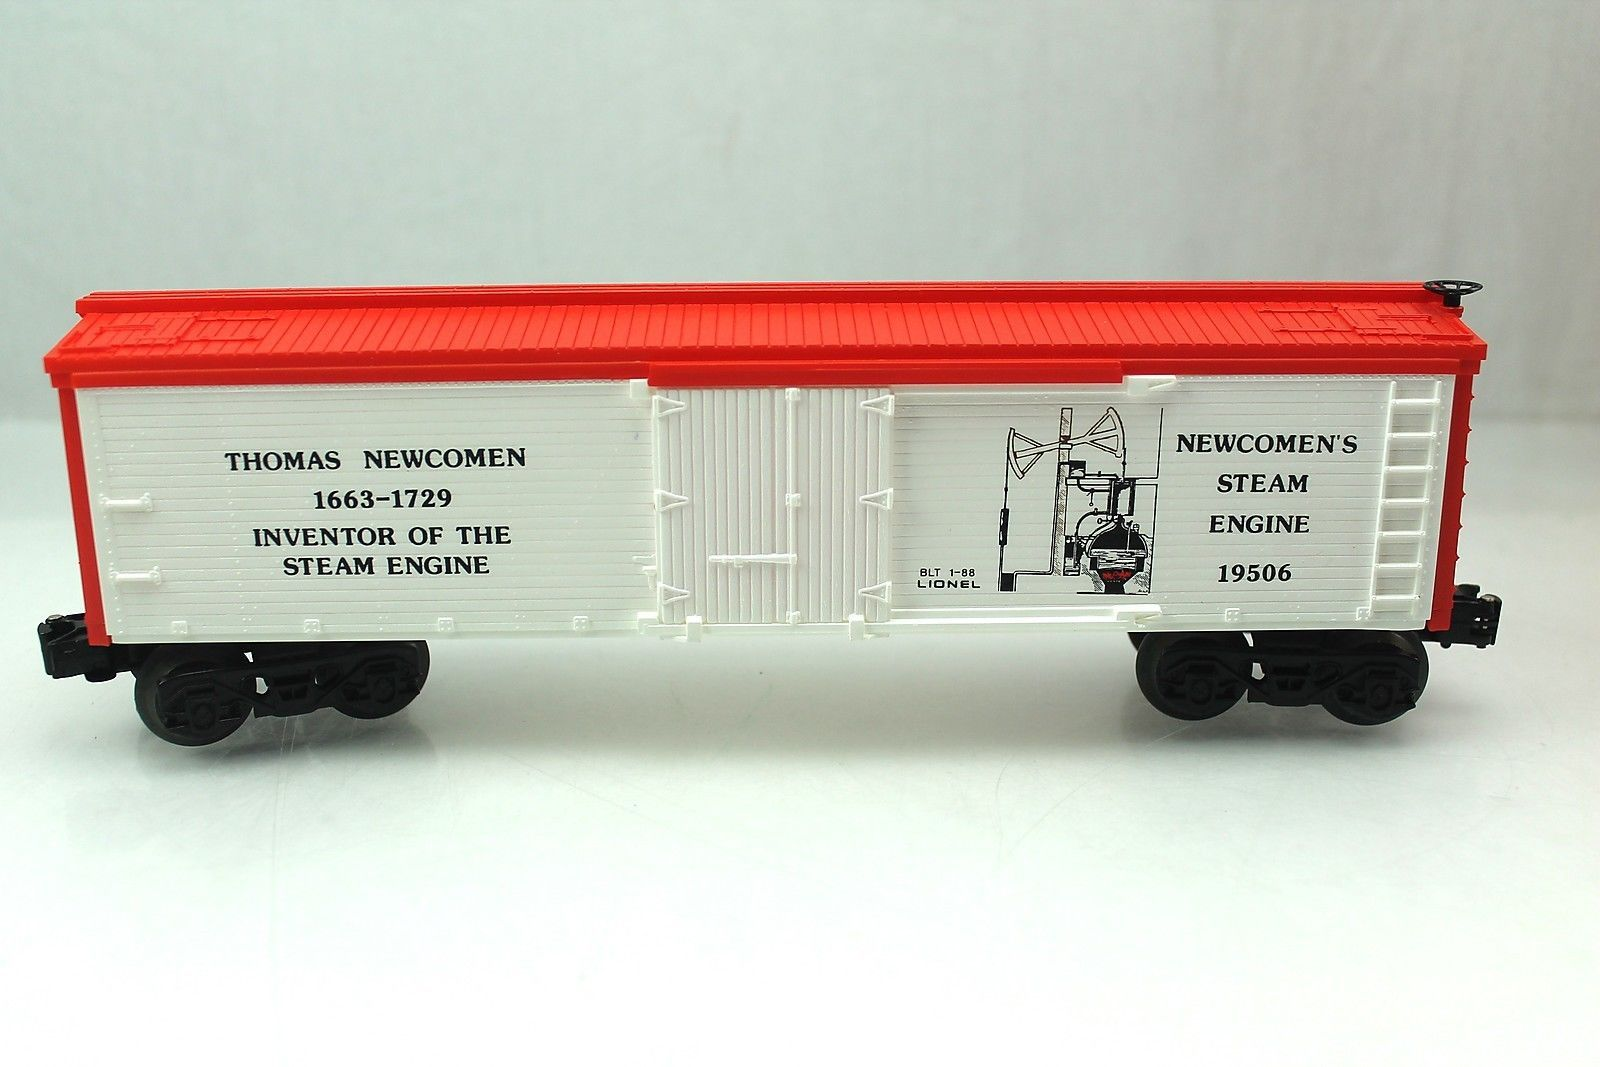 O Lionel 19506 Thomas Newcomen Steam Engine Inventory Box Car Reefer 6 19506 Box Car Steam Engine Engineering